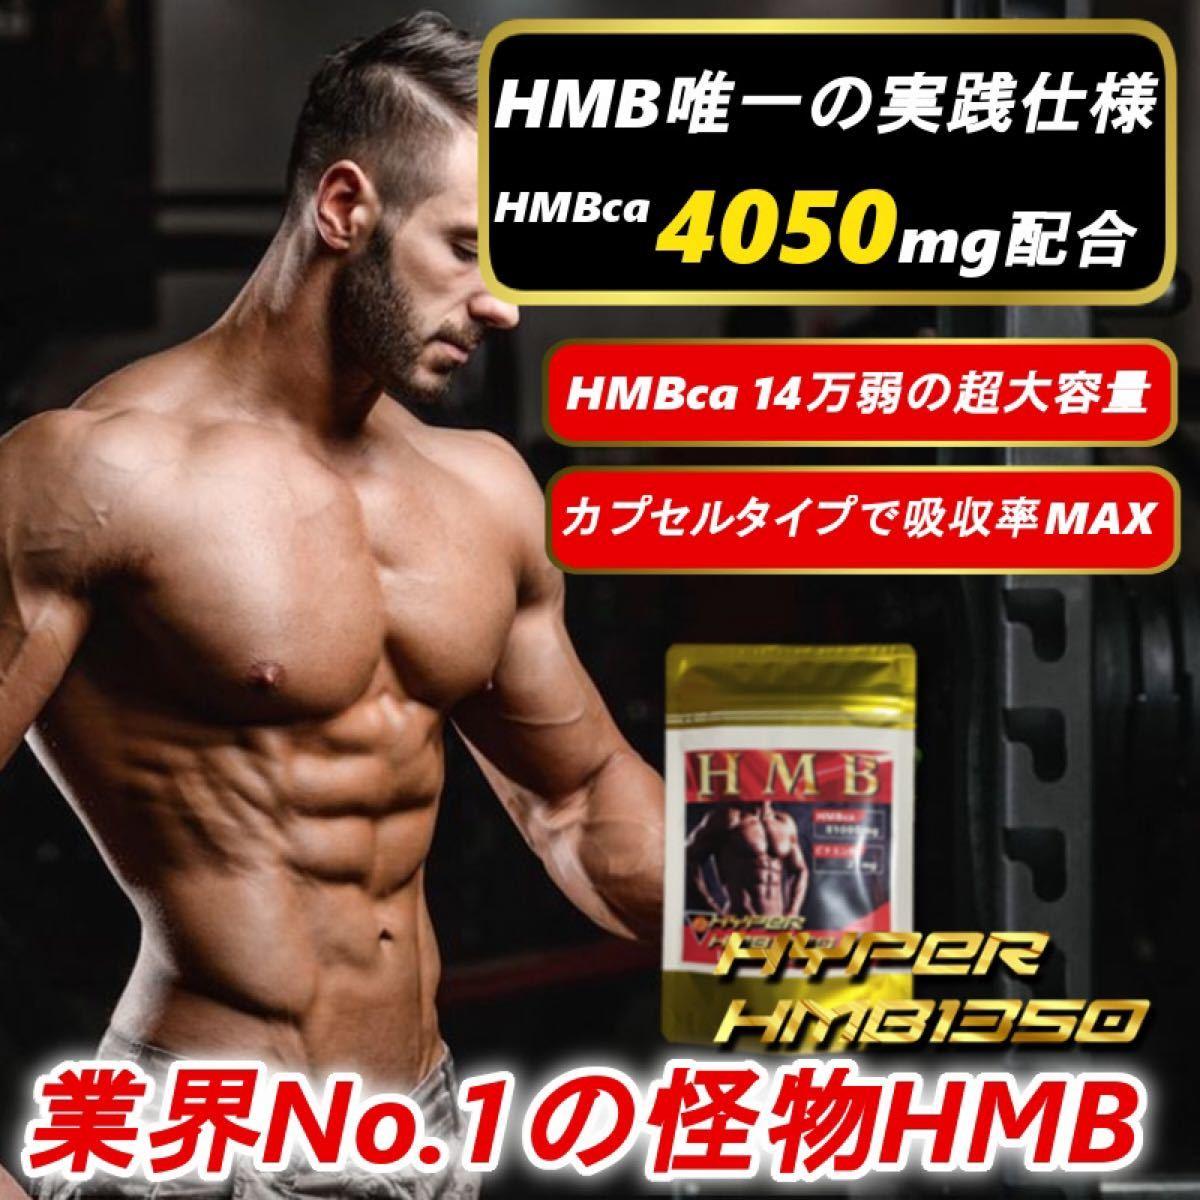 Hmb ファイラ マッスル サプリ